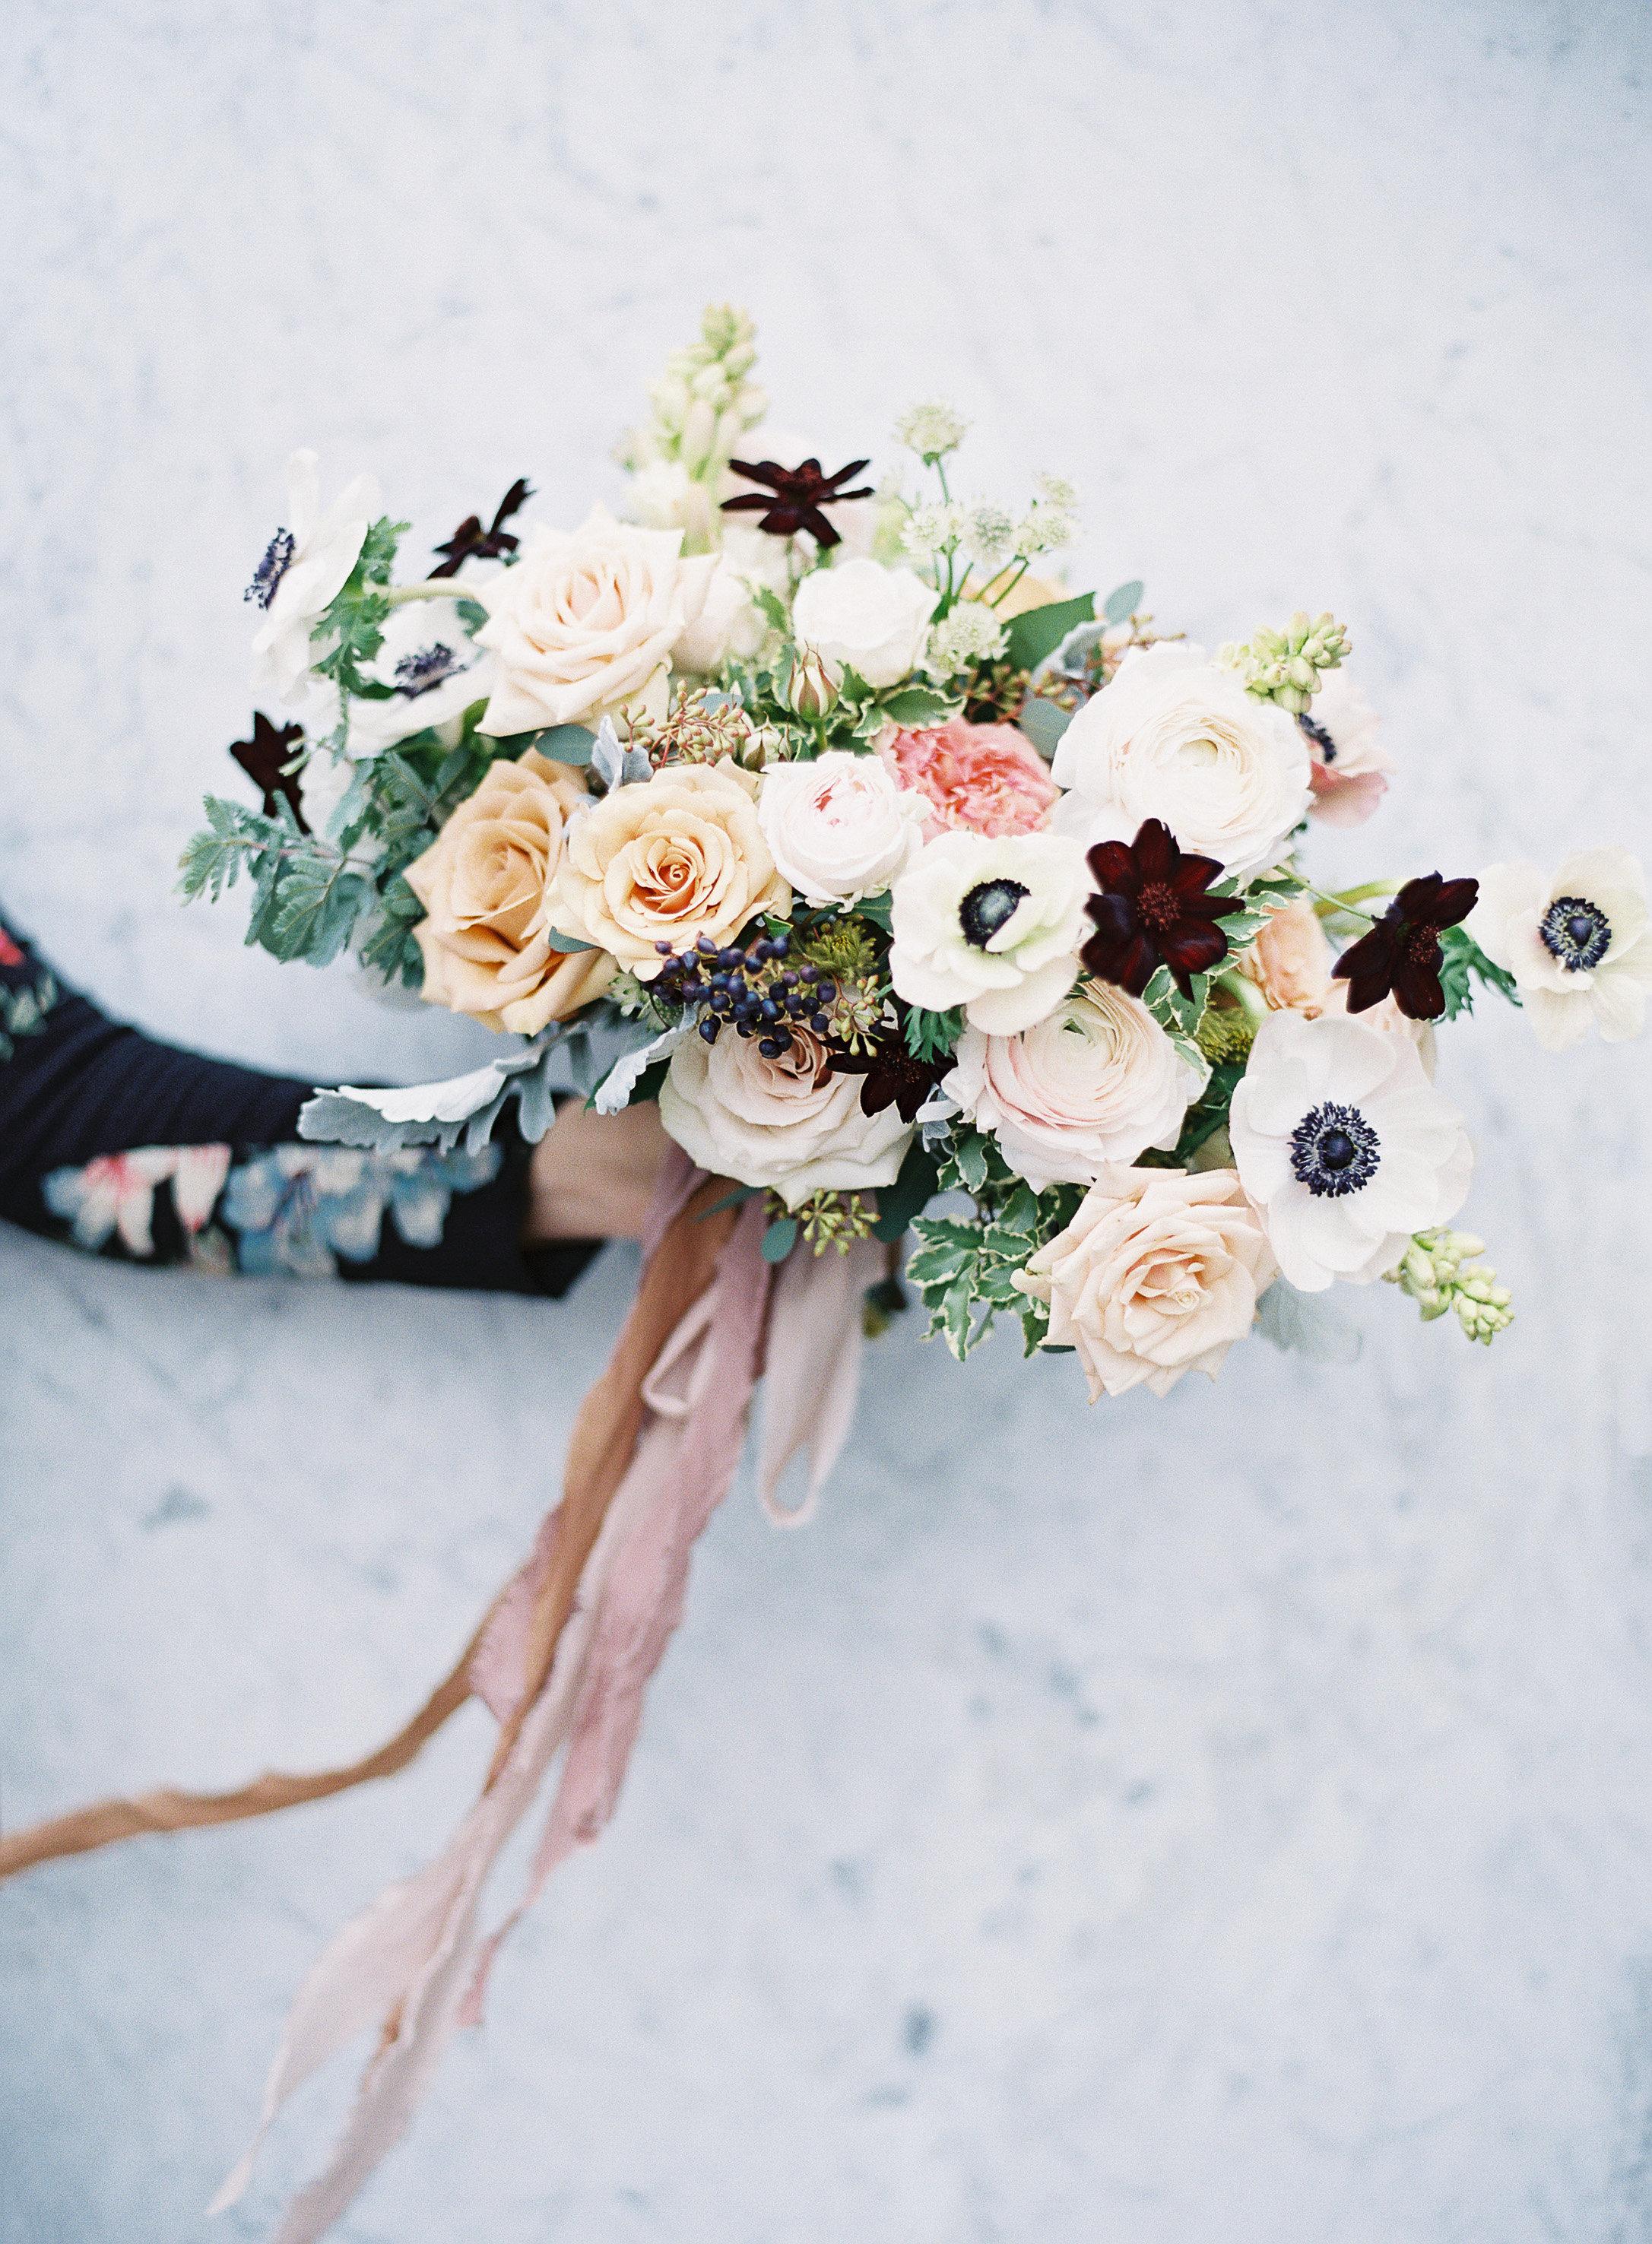 Tono and Co Lavenders Flowers-Lavenders Flowers-0014.jpg